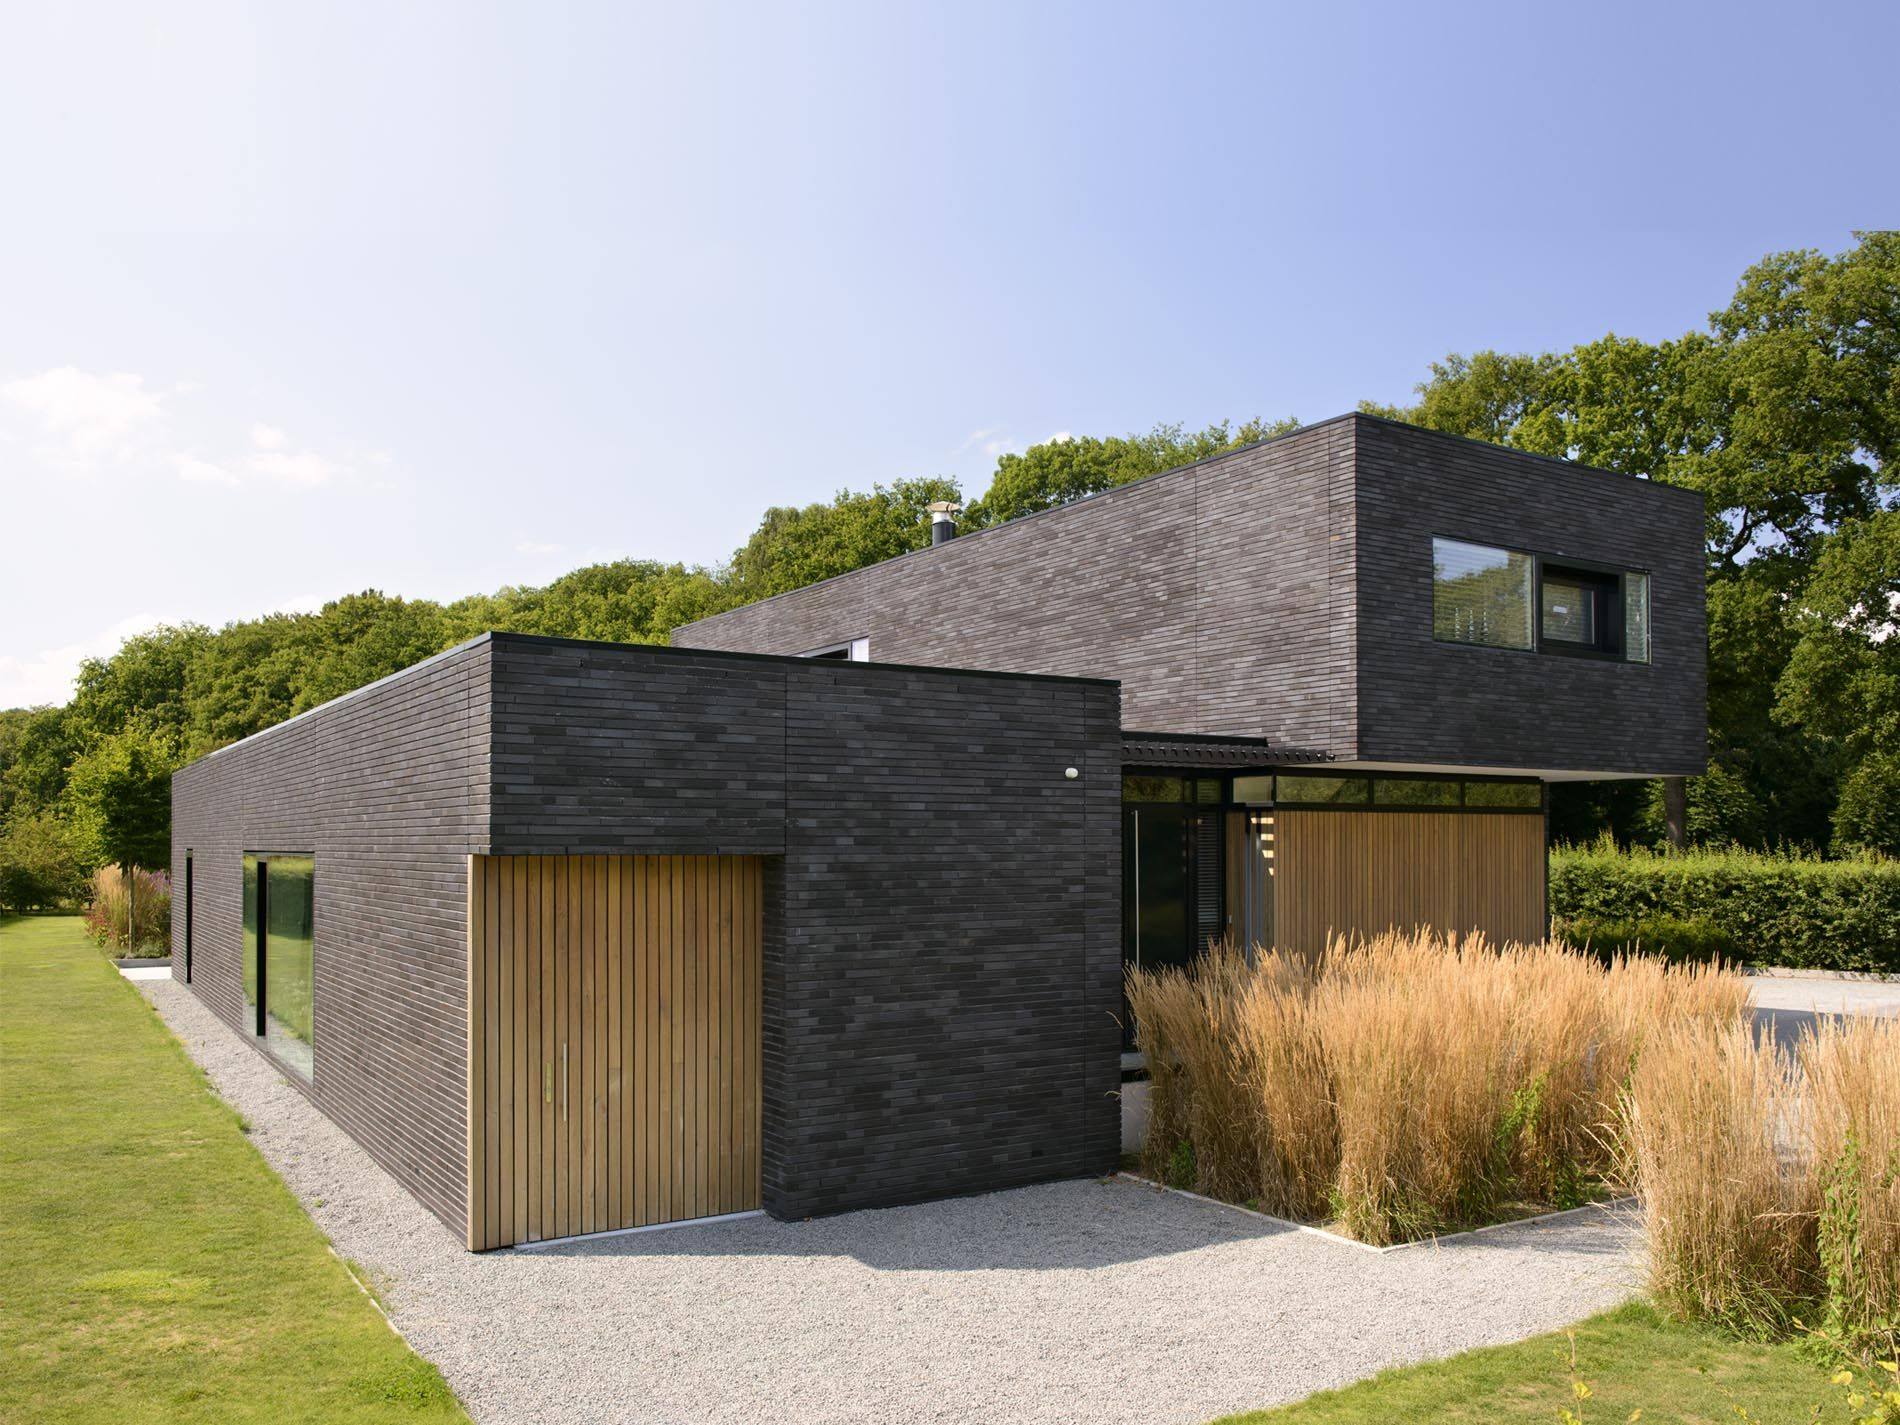 Donkere baksteen hout moderne architectuur maas for Kleine huizen bouwen